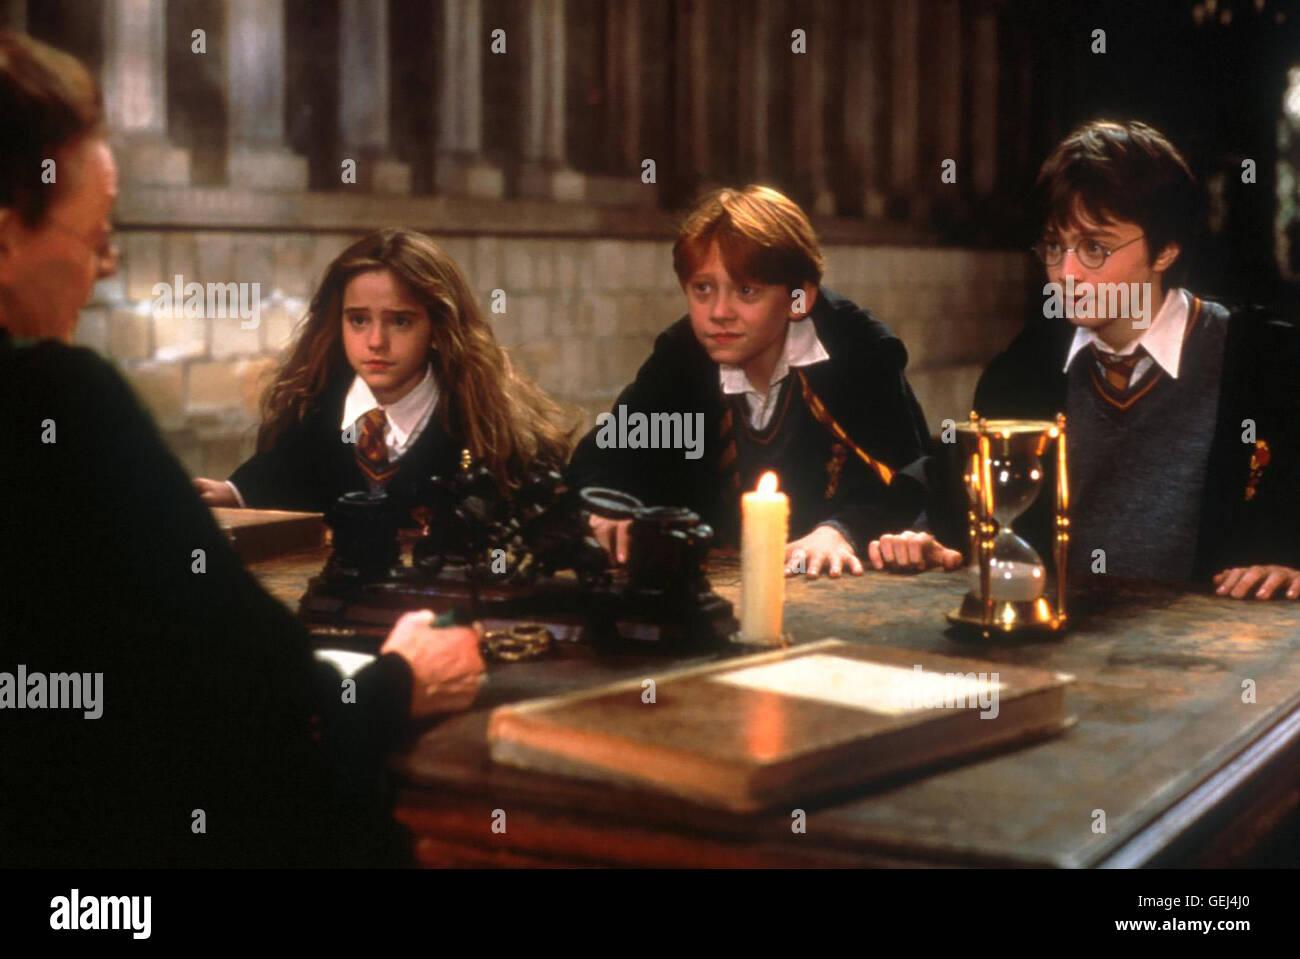 Emma Watson, Rupert Grint, Daniel Radcliffe,  Hermine (Emma Watson), Ron (Rupert Grint) und Harry (Daniel Radcliffe) - Stock Image